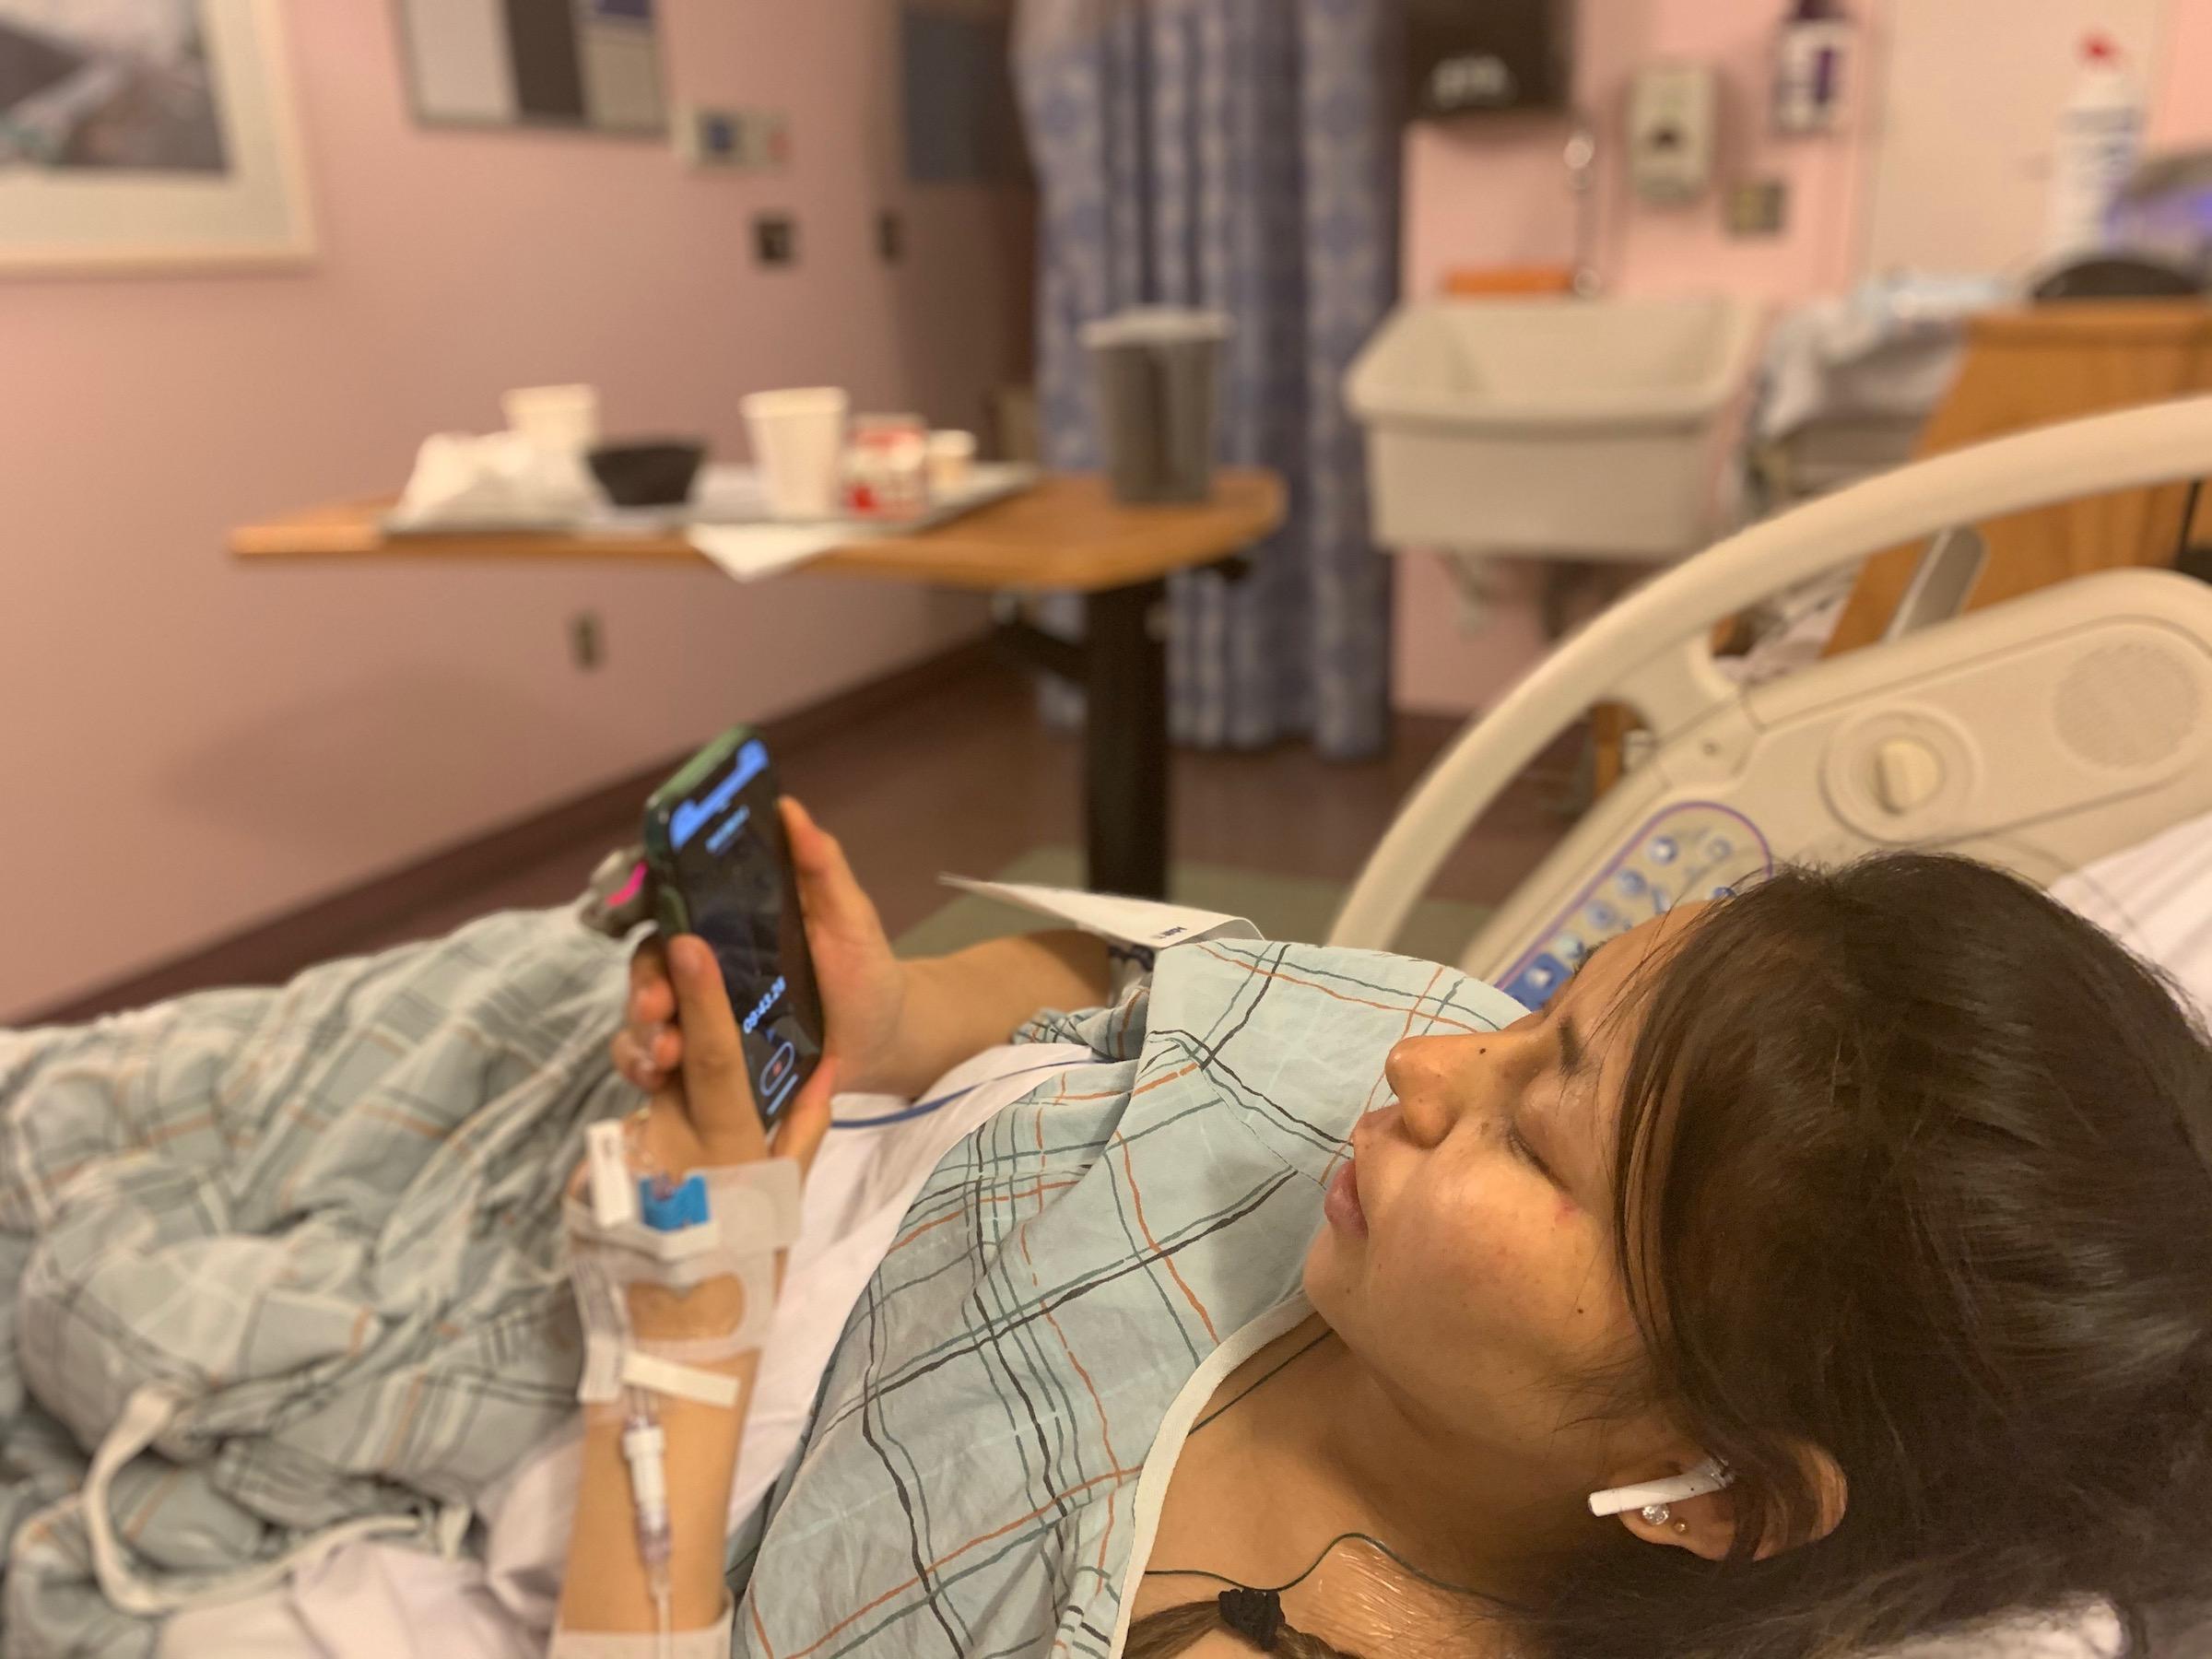 https://mk0itemsssrcorgqb419.kinstacdn.com/wp-content/uploads/2021/06/Himalayan-hospital-patient.jpeg